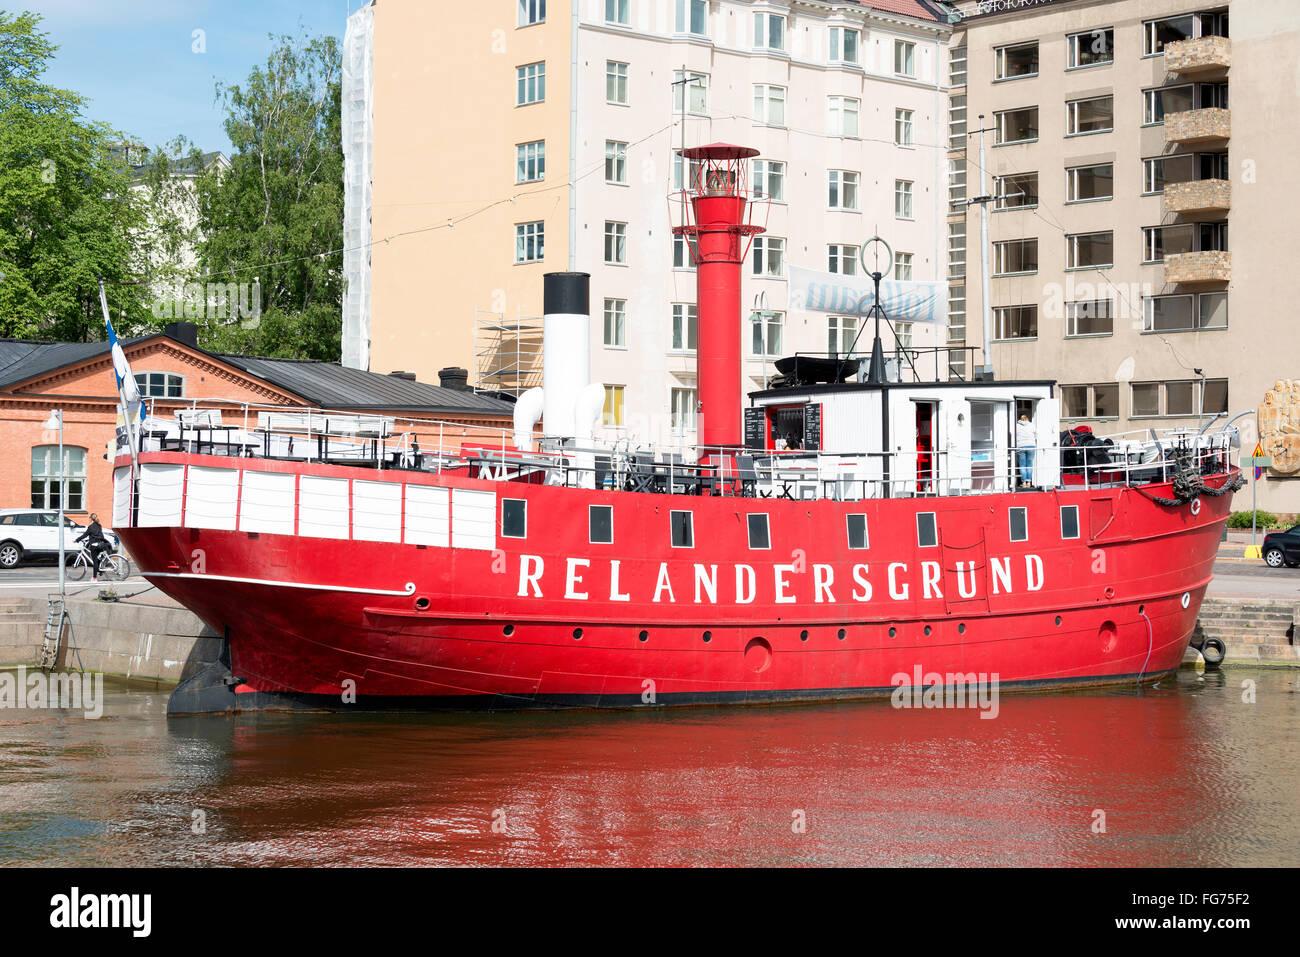 Relandersgrund Bar in converted lighthouse ship, Meritullintori, Pohjoisranta, Helsinki, Uusimaa Region, Republic - Stock Image